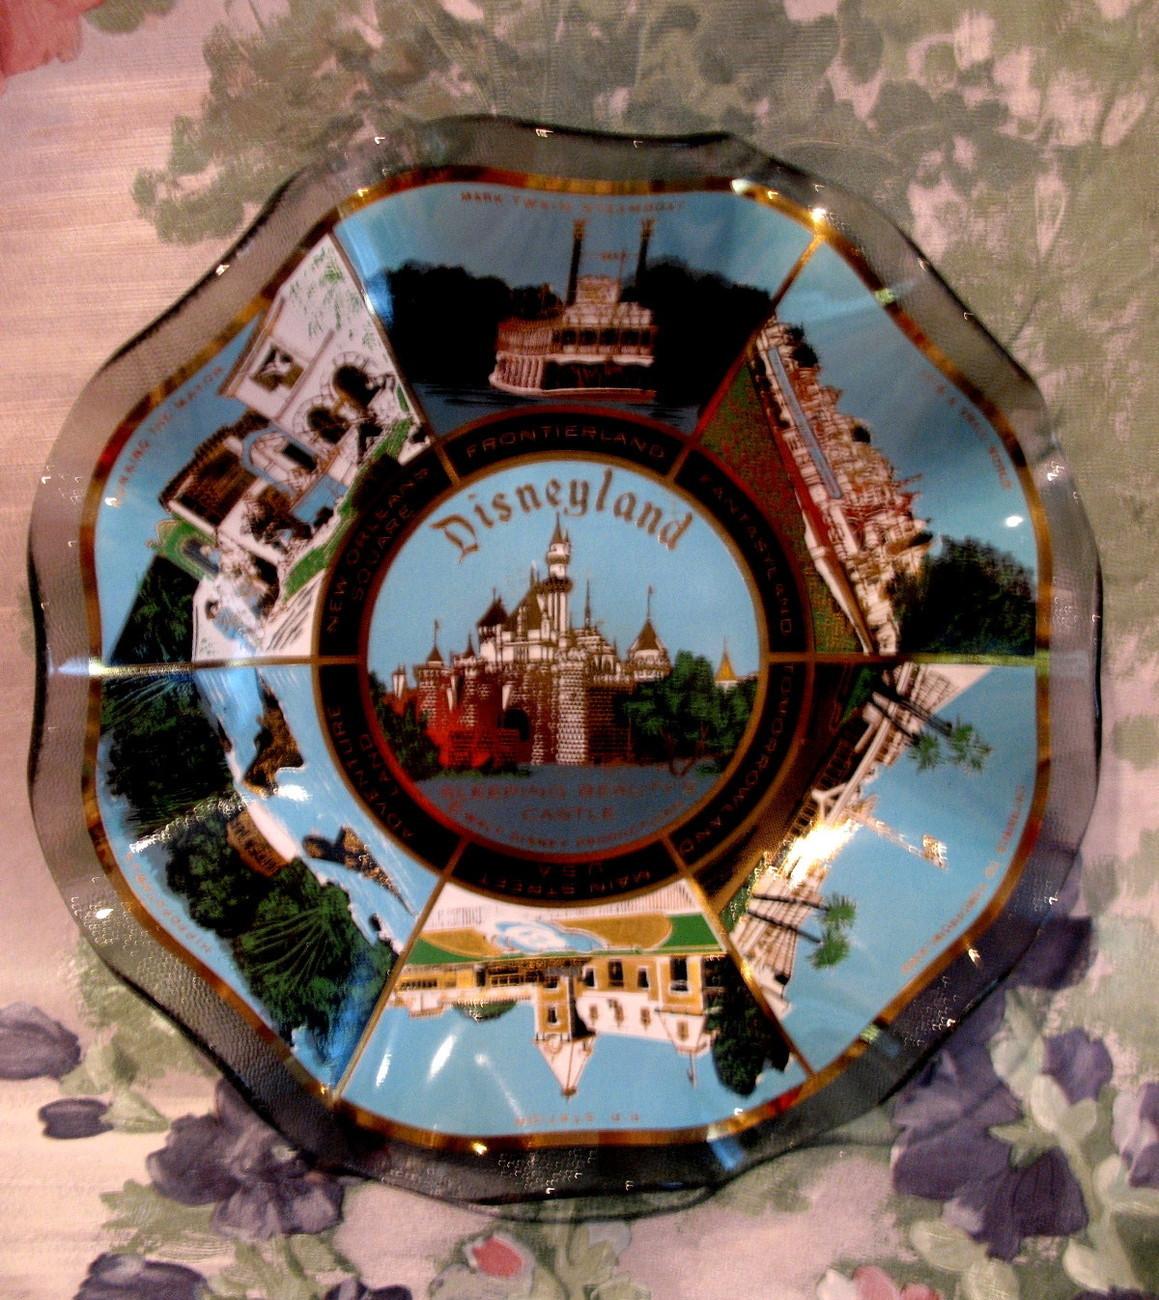 Disneyland Sleeping Beauty Castle Fantasyland Souvenir Dish